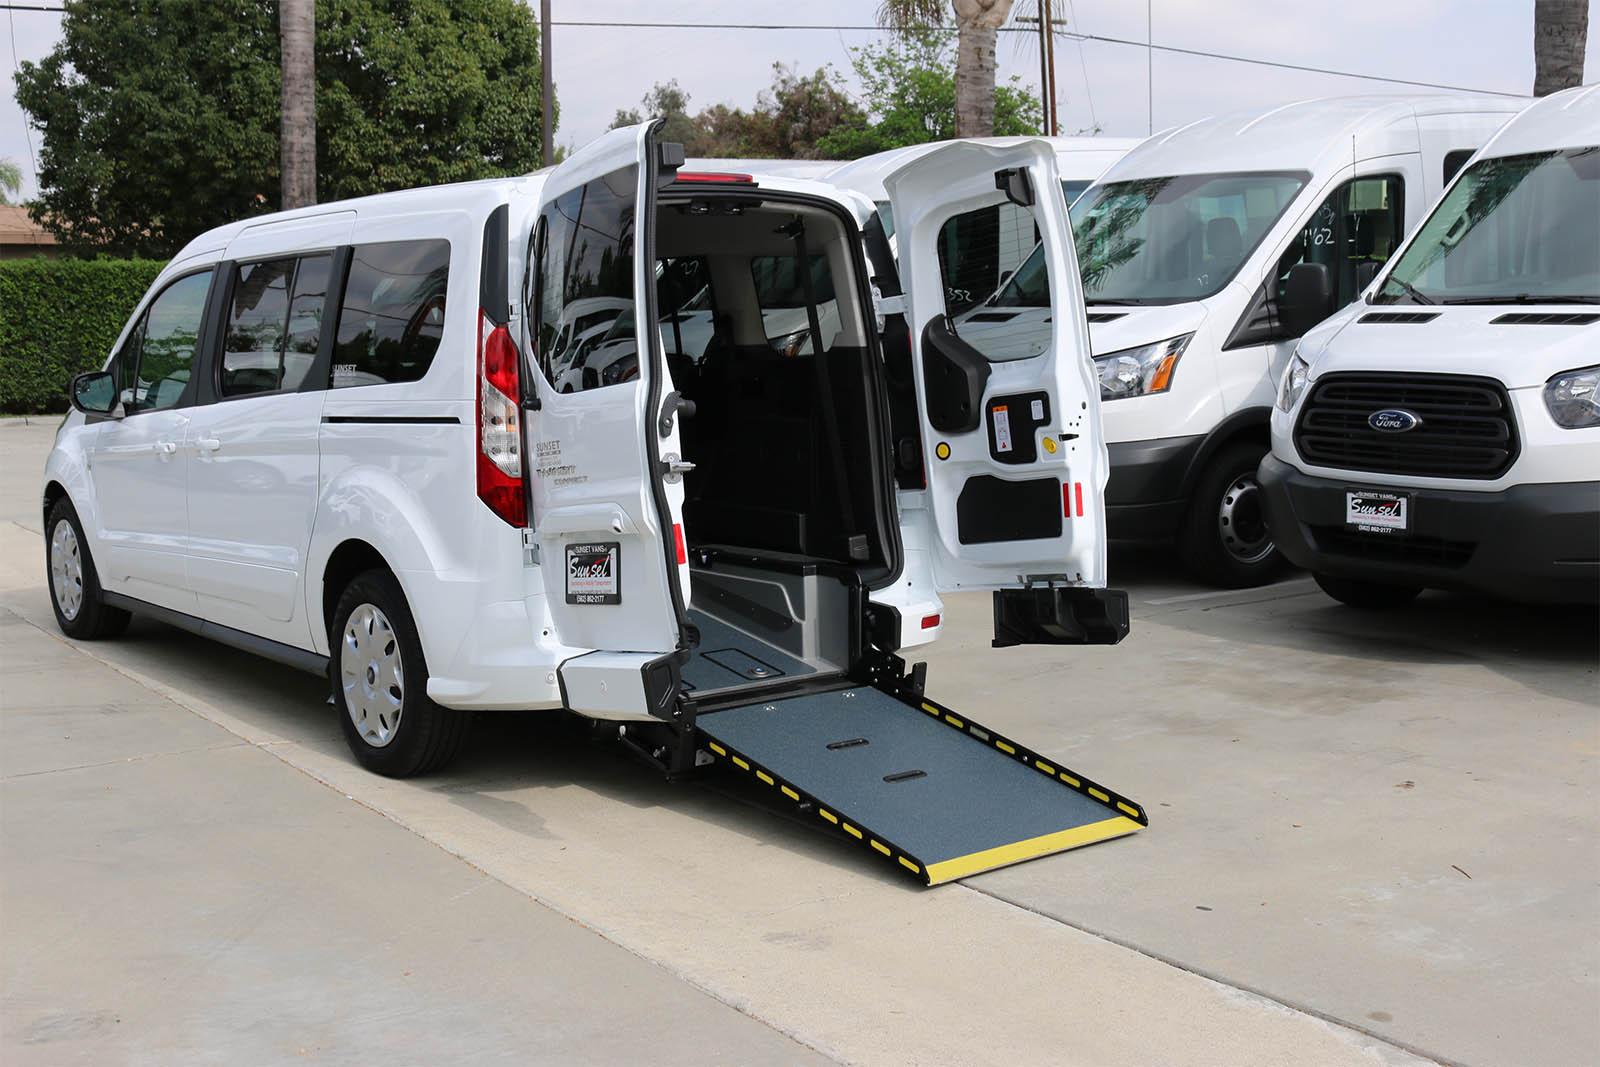 wheelchair van parts rattan swivel chairs and stretcher vans manufacturer for nemt transport